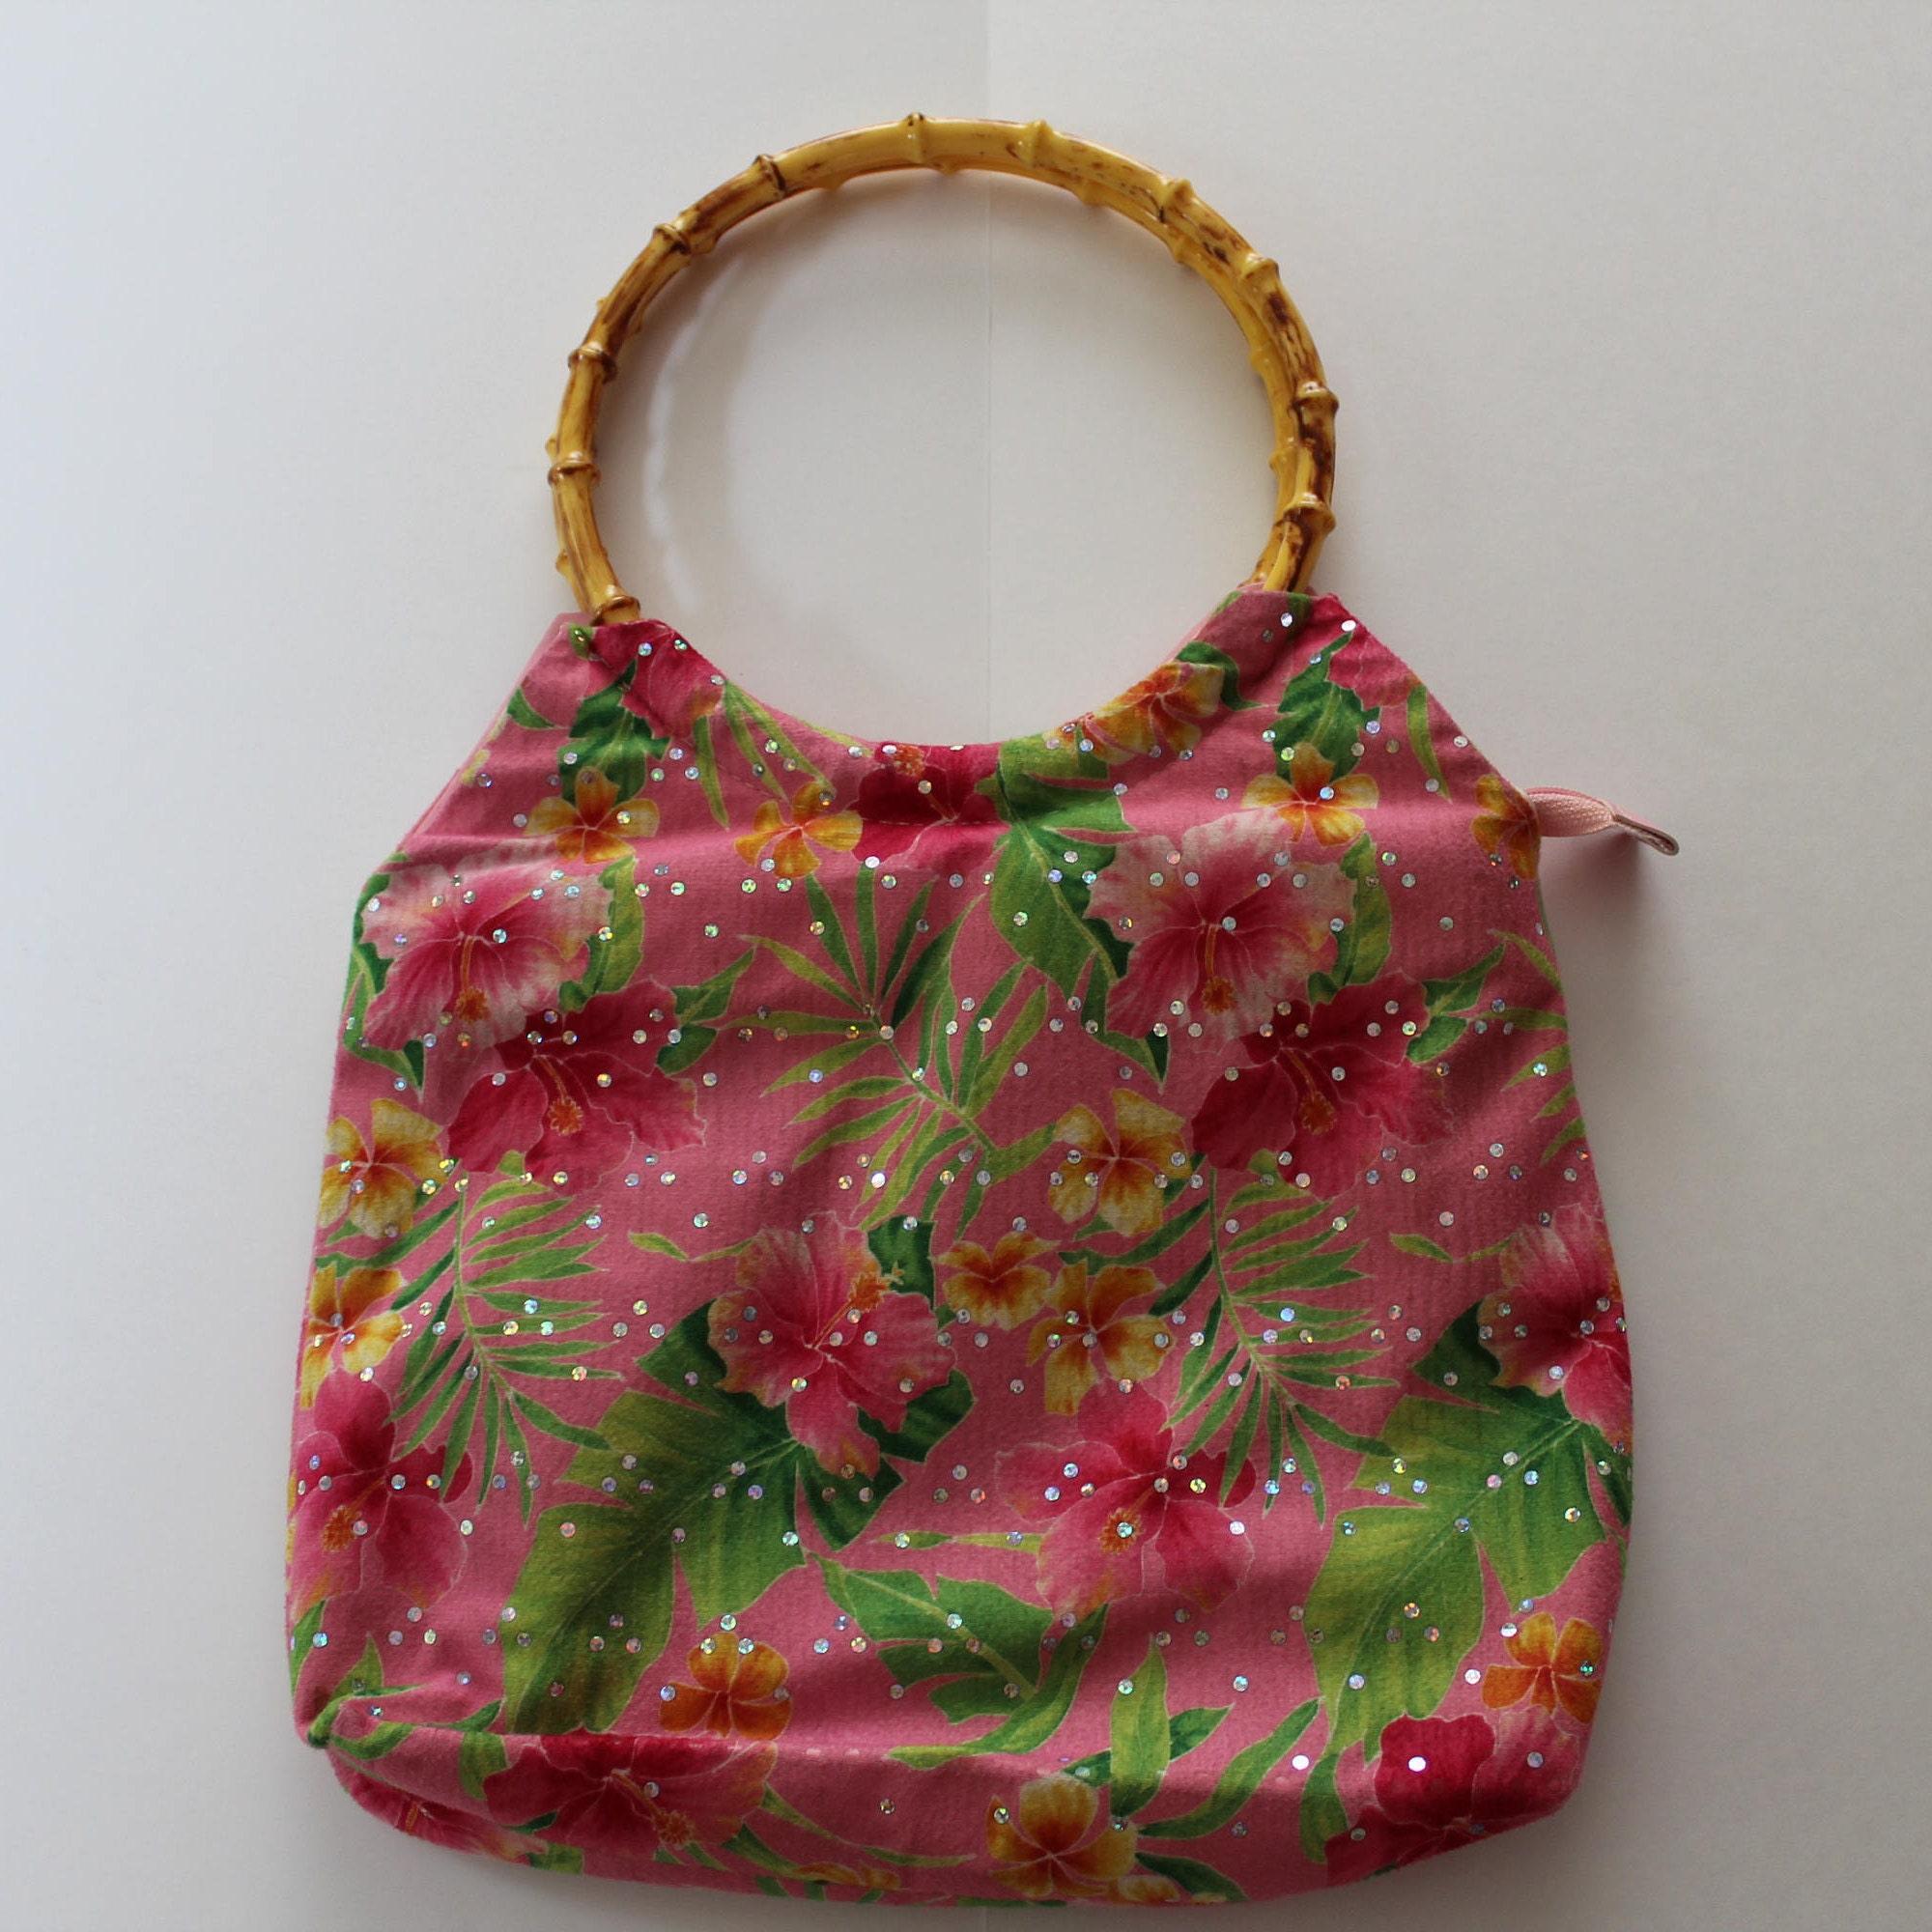 08a5b5f21413 Vintage floral fabric shoulder bag with faux wood top handles  Chic retro  fabric shoulder purse